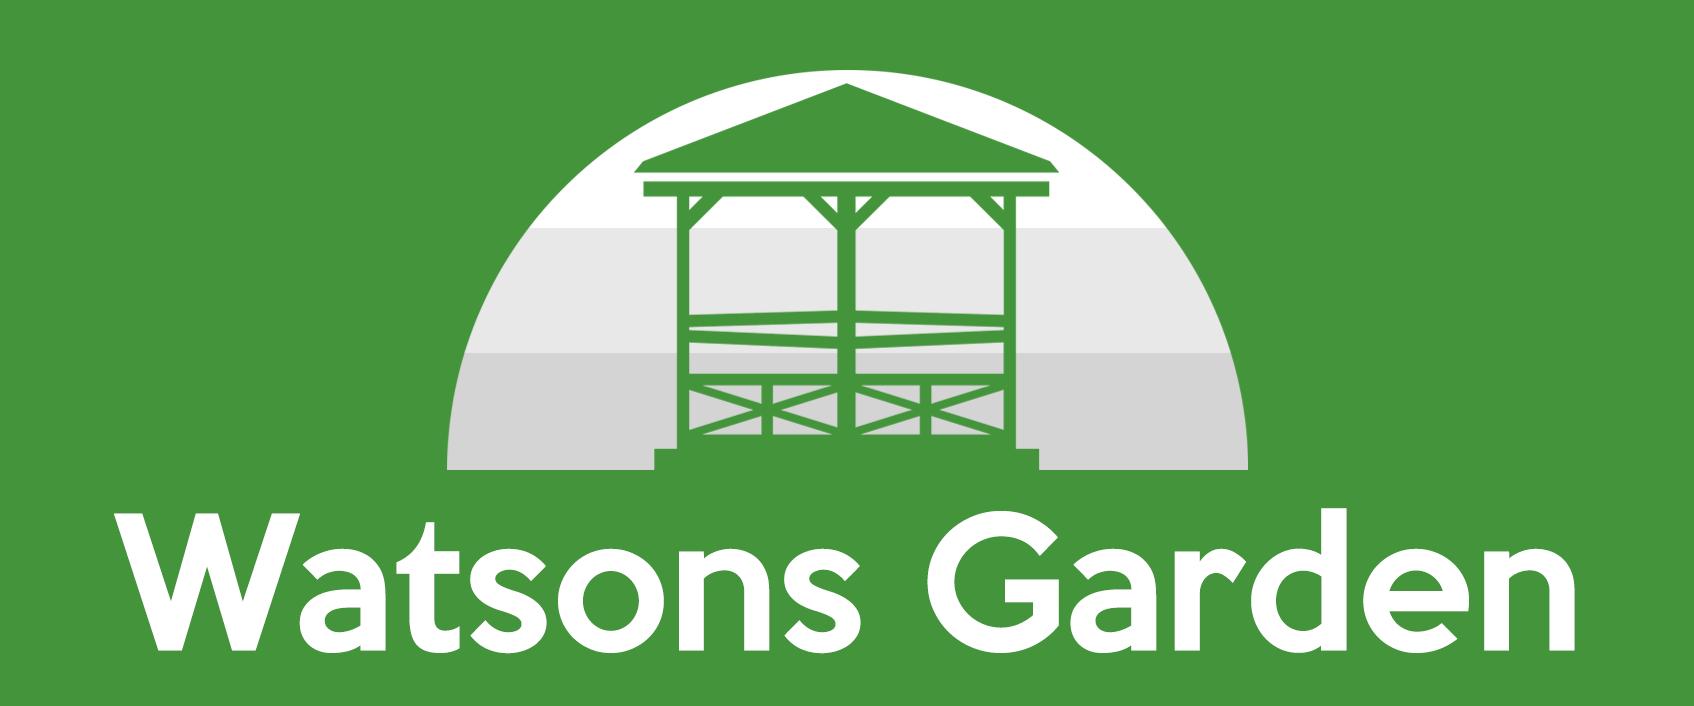 Watsons Garden